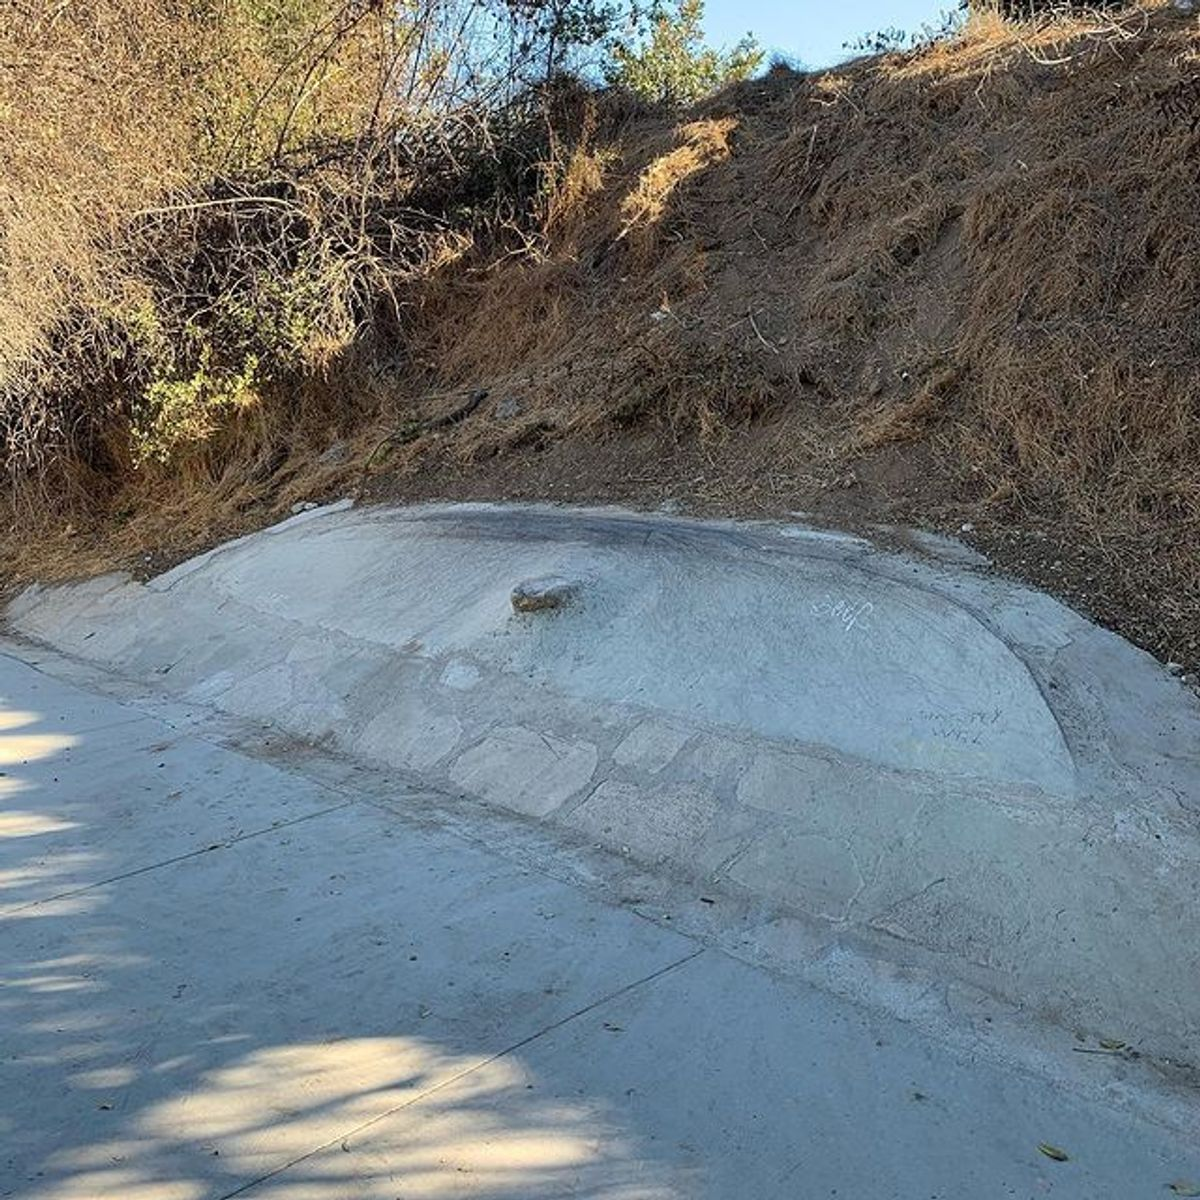 Image for skate spot South Pasadena Nature Park DIY Banks